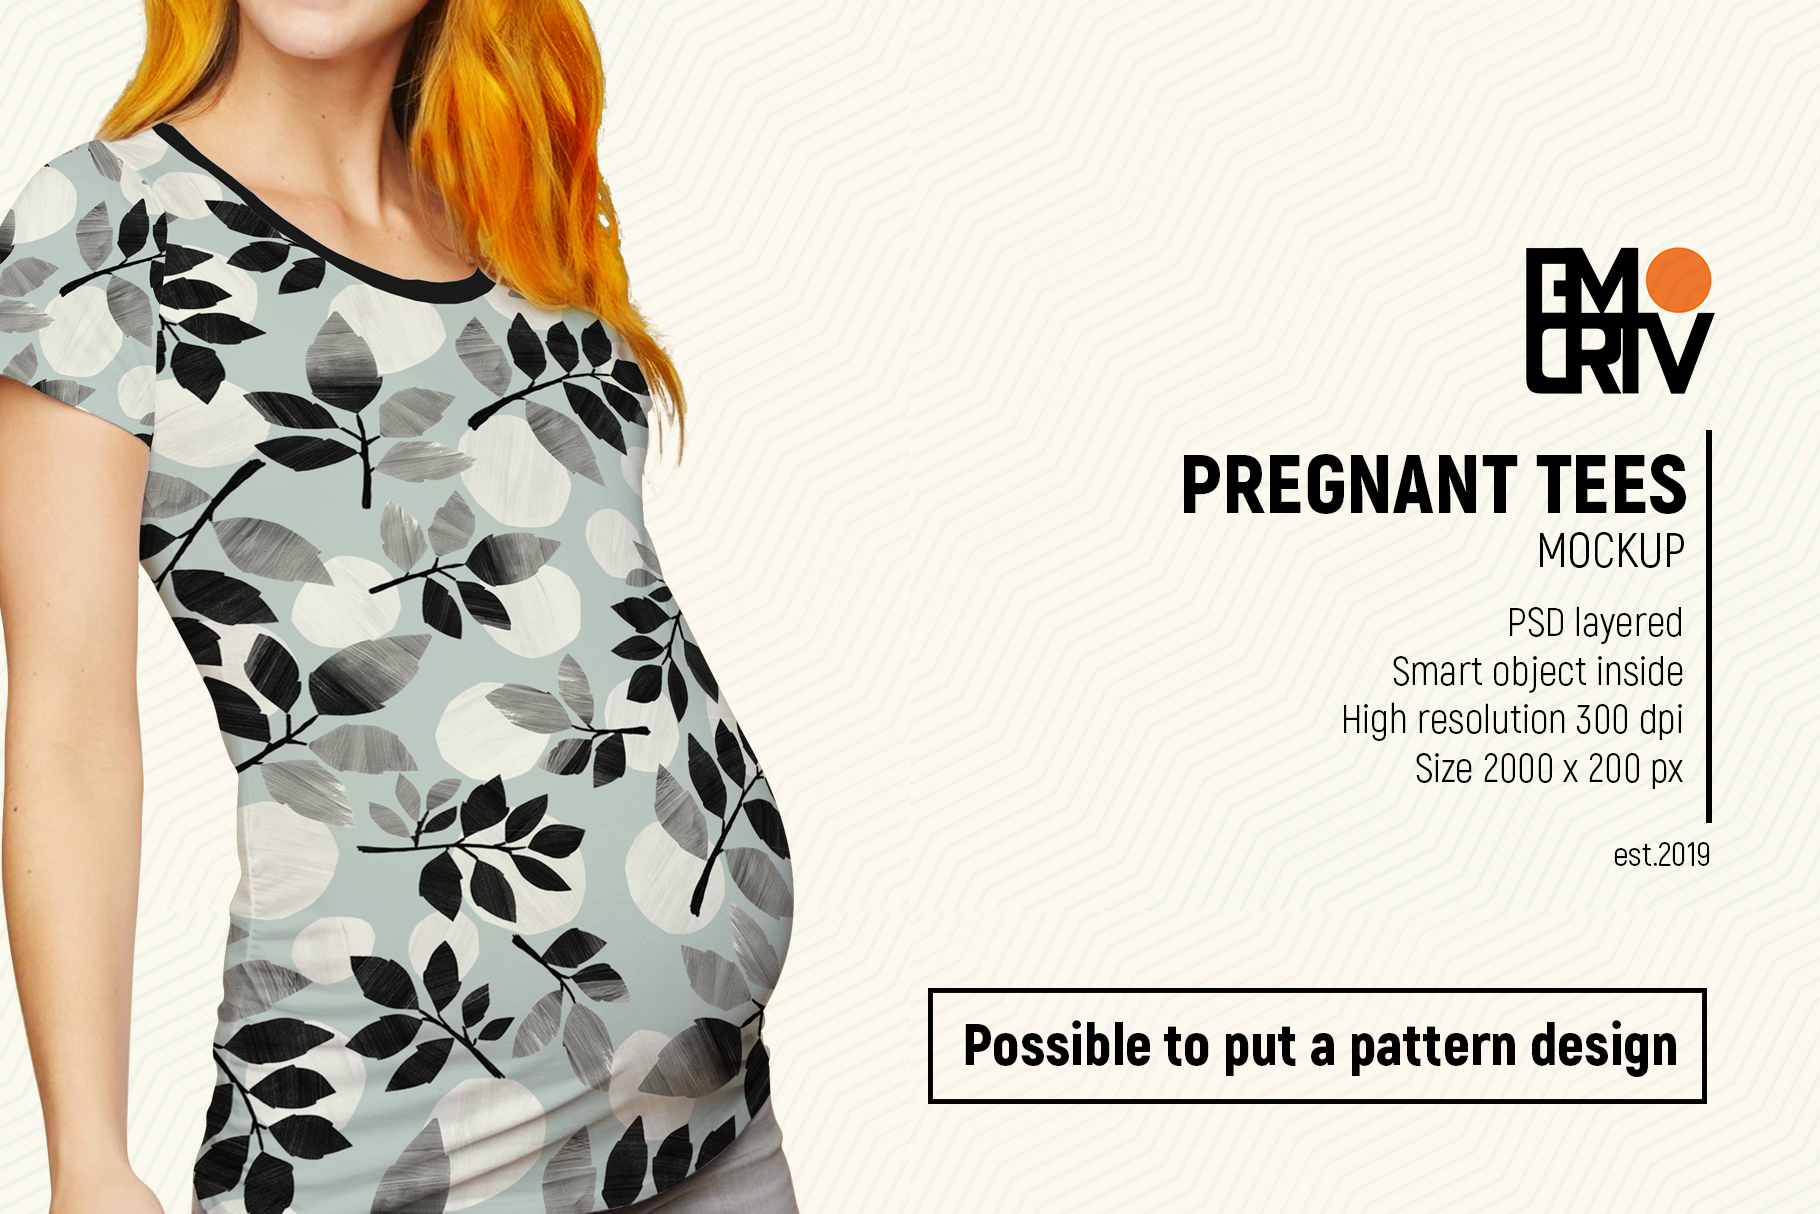 Pregnant Tees Mockup example image 6